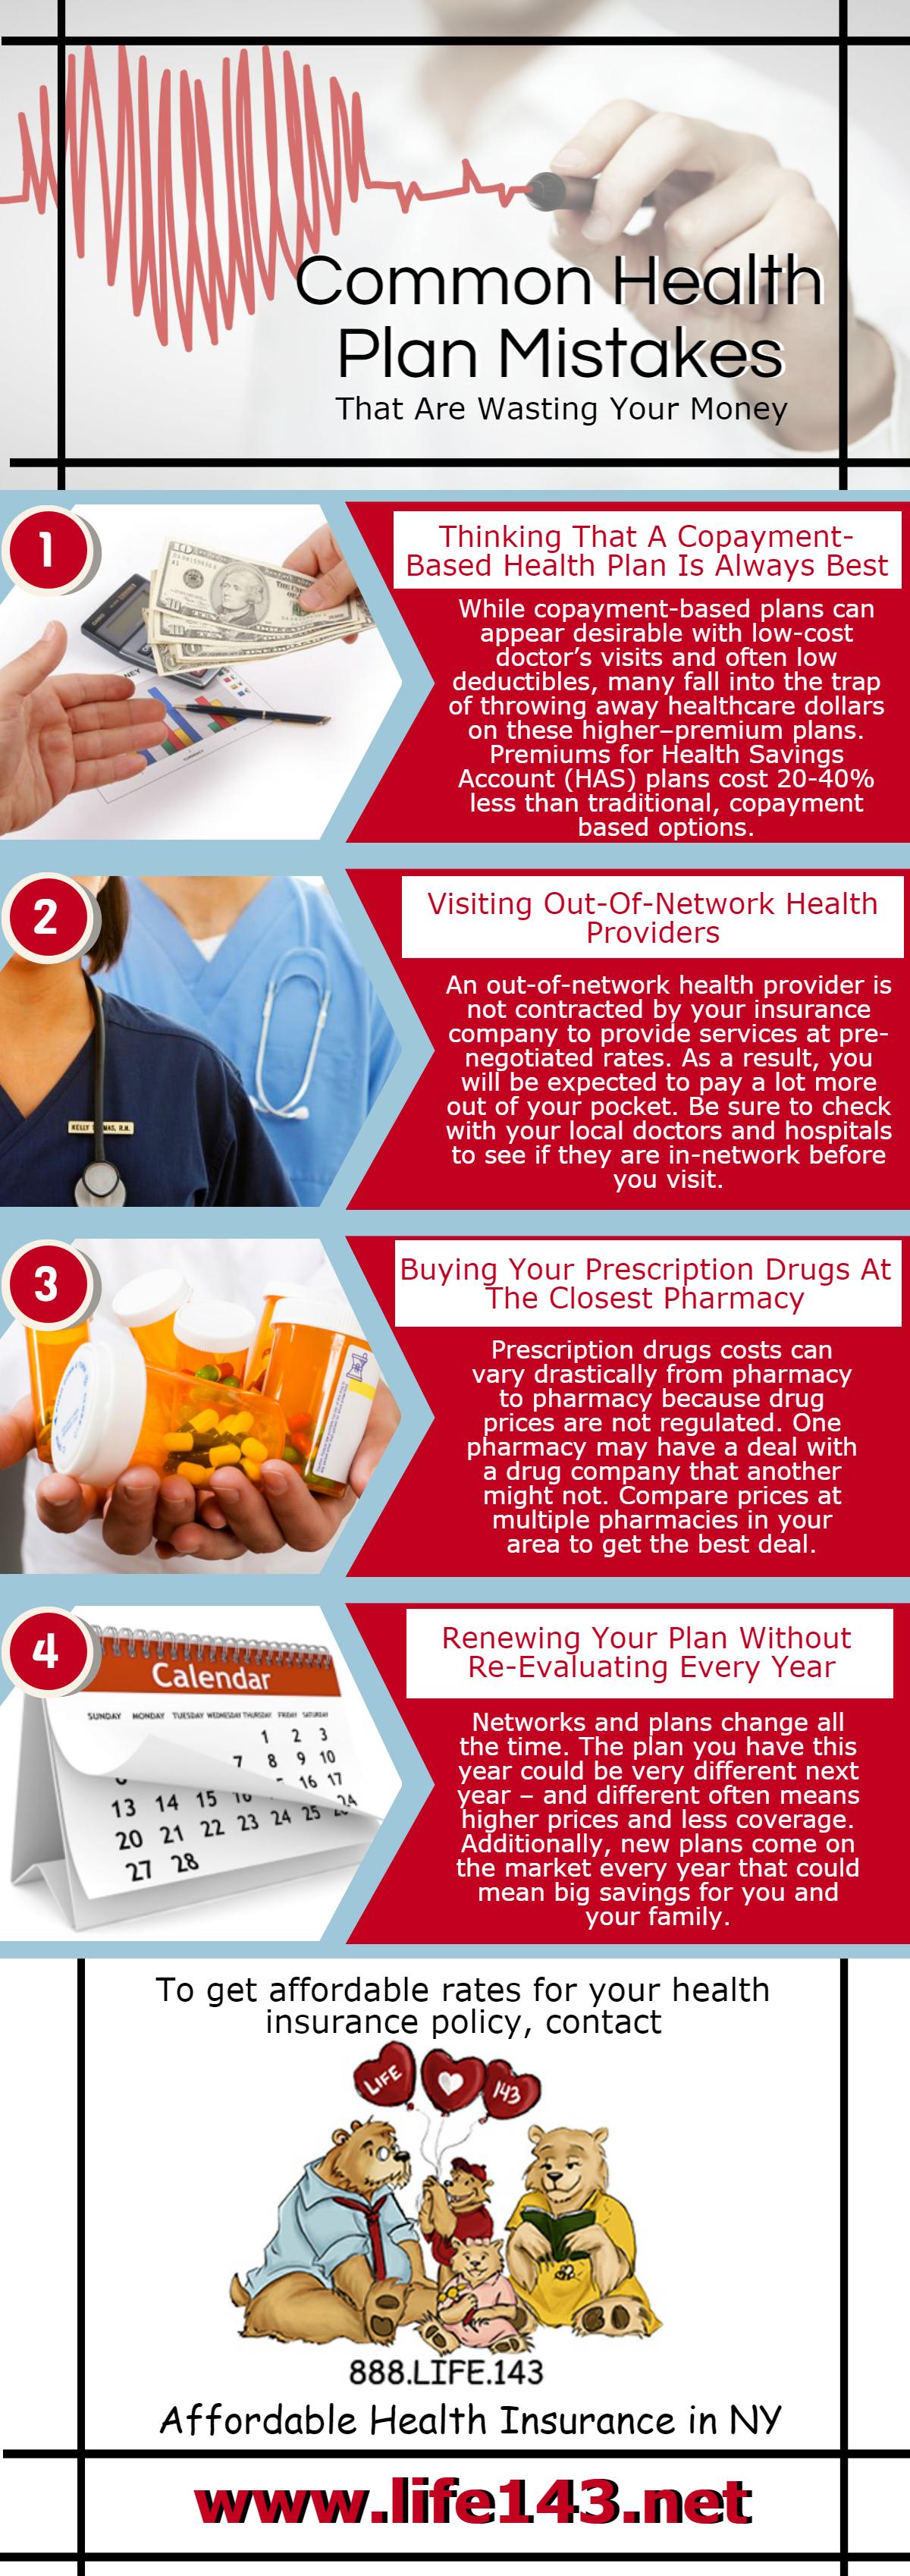 Oscar is an emerging but popular health insurance provider